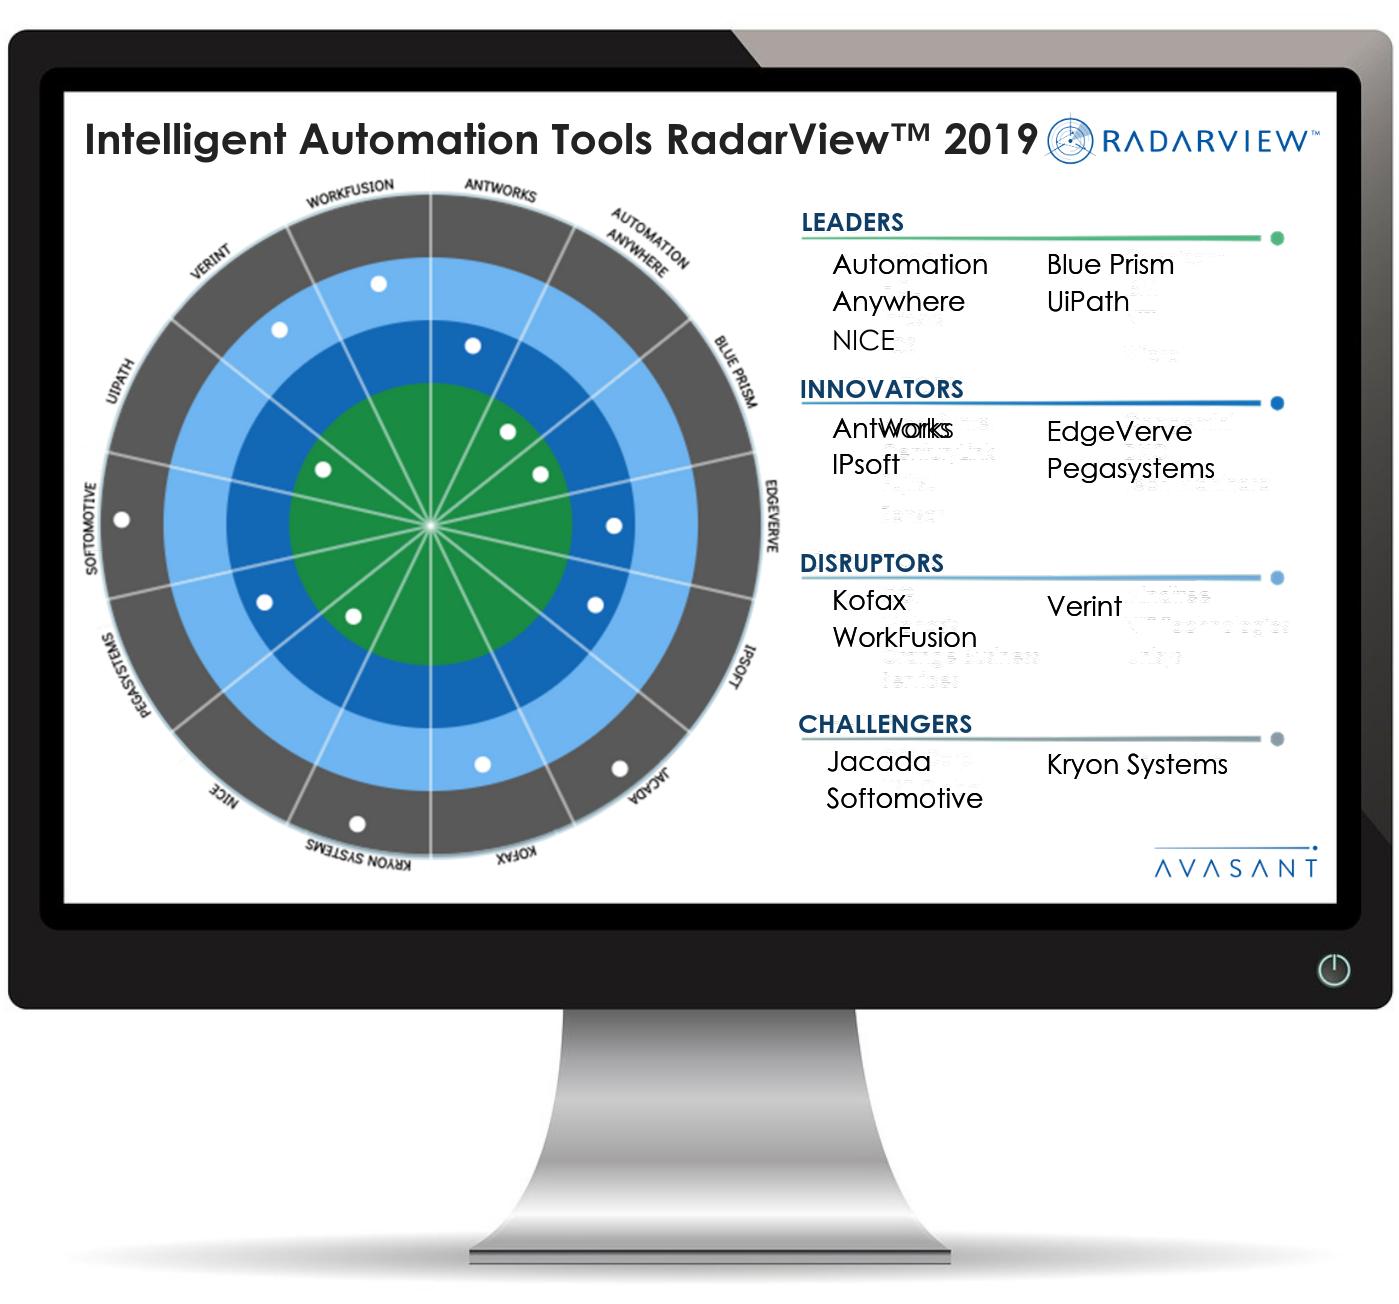 IA Tools 2019 1 - IA Tools 2019 AntWorks RadarView™ Profile